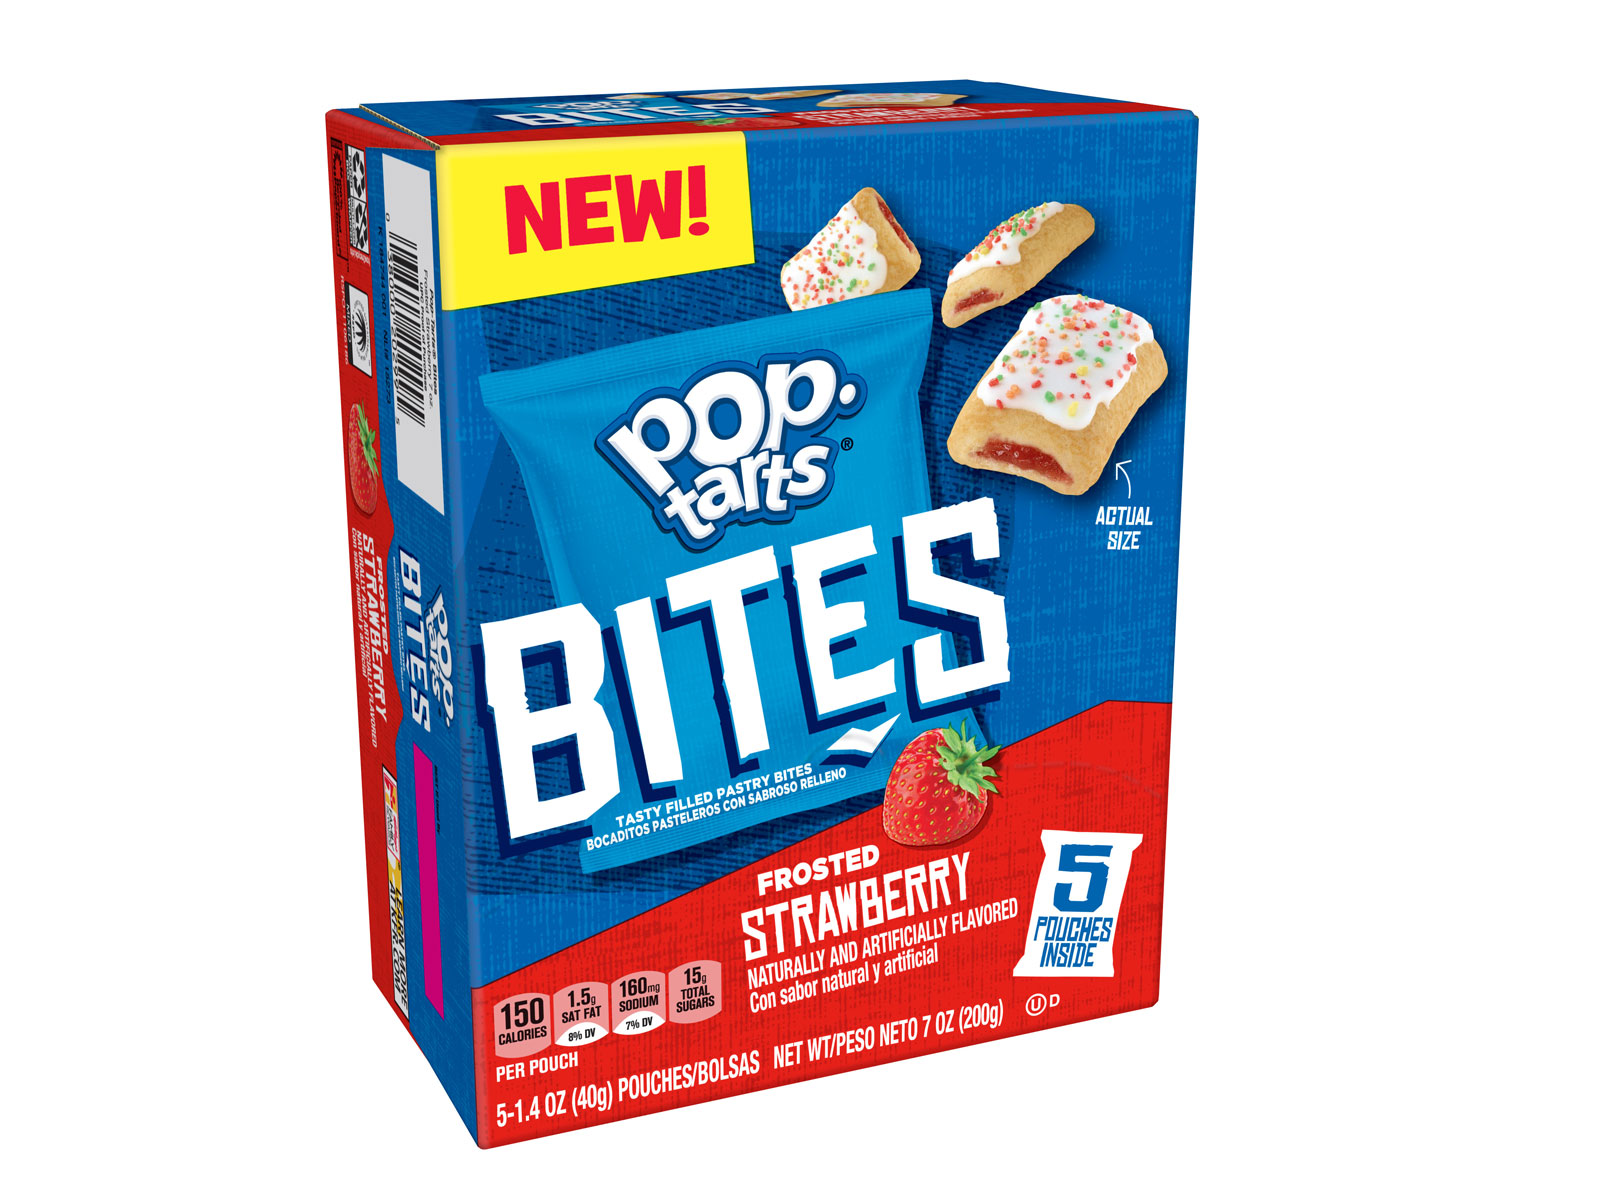 Strawberry Pop-Tart Bites